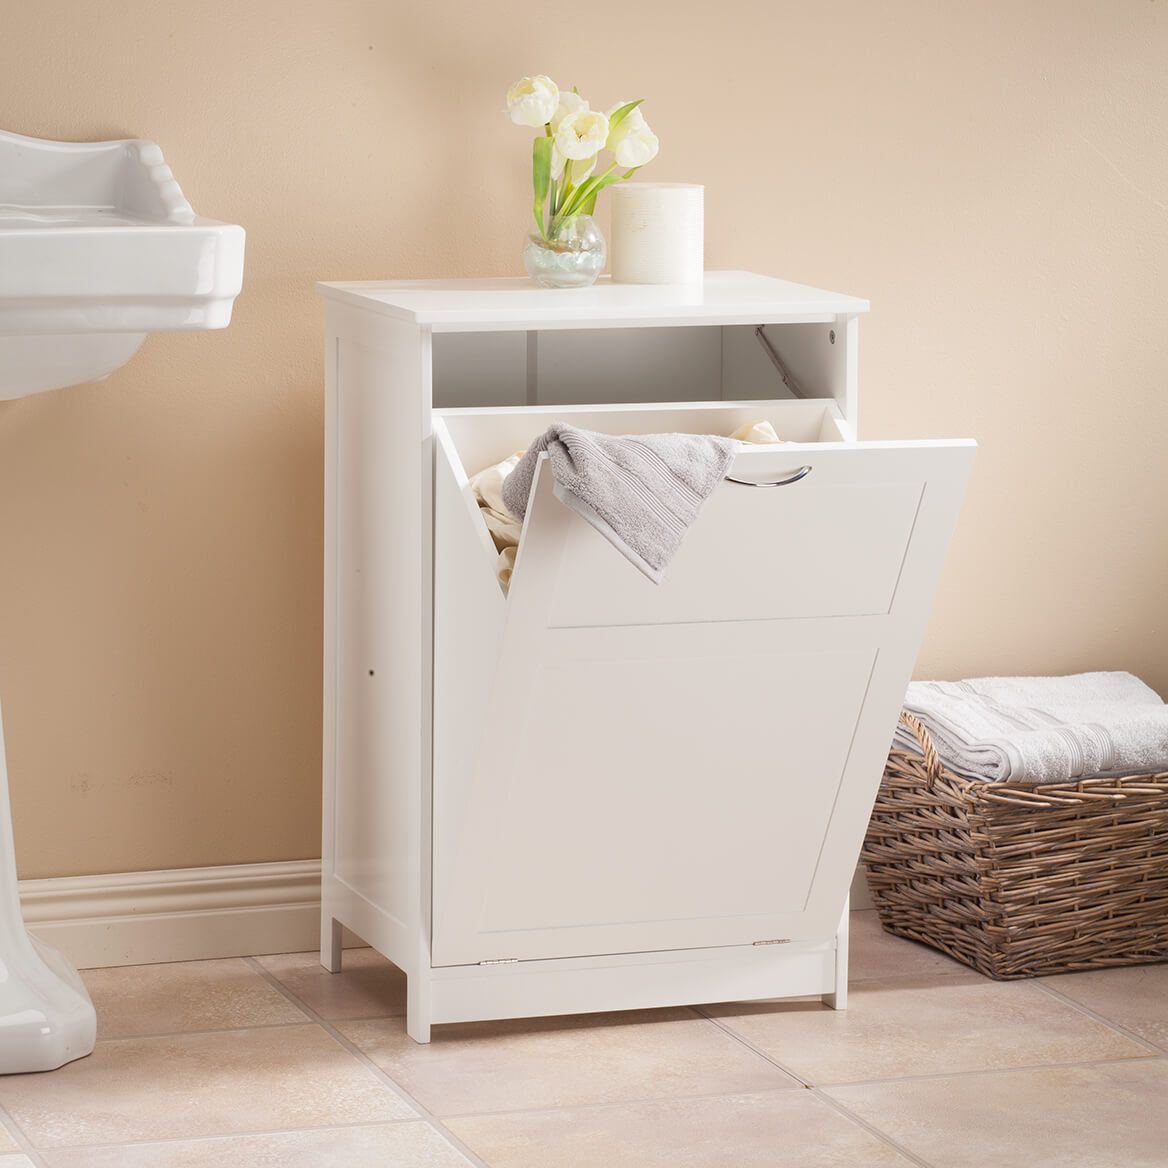 Laundry Hamper by OakRidge™     XL-366759